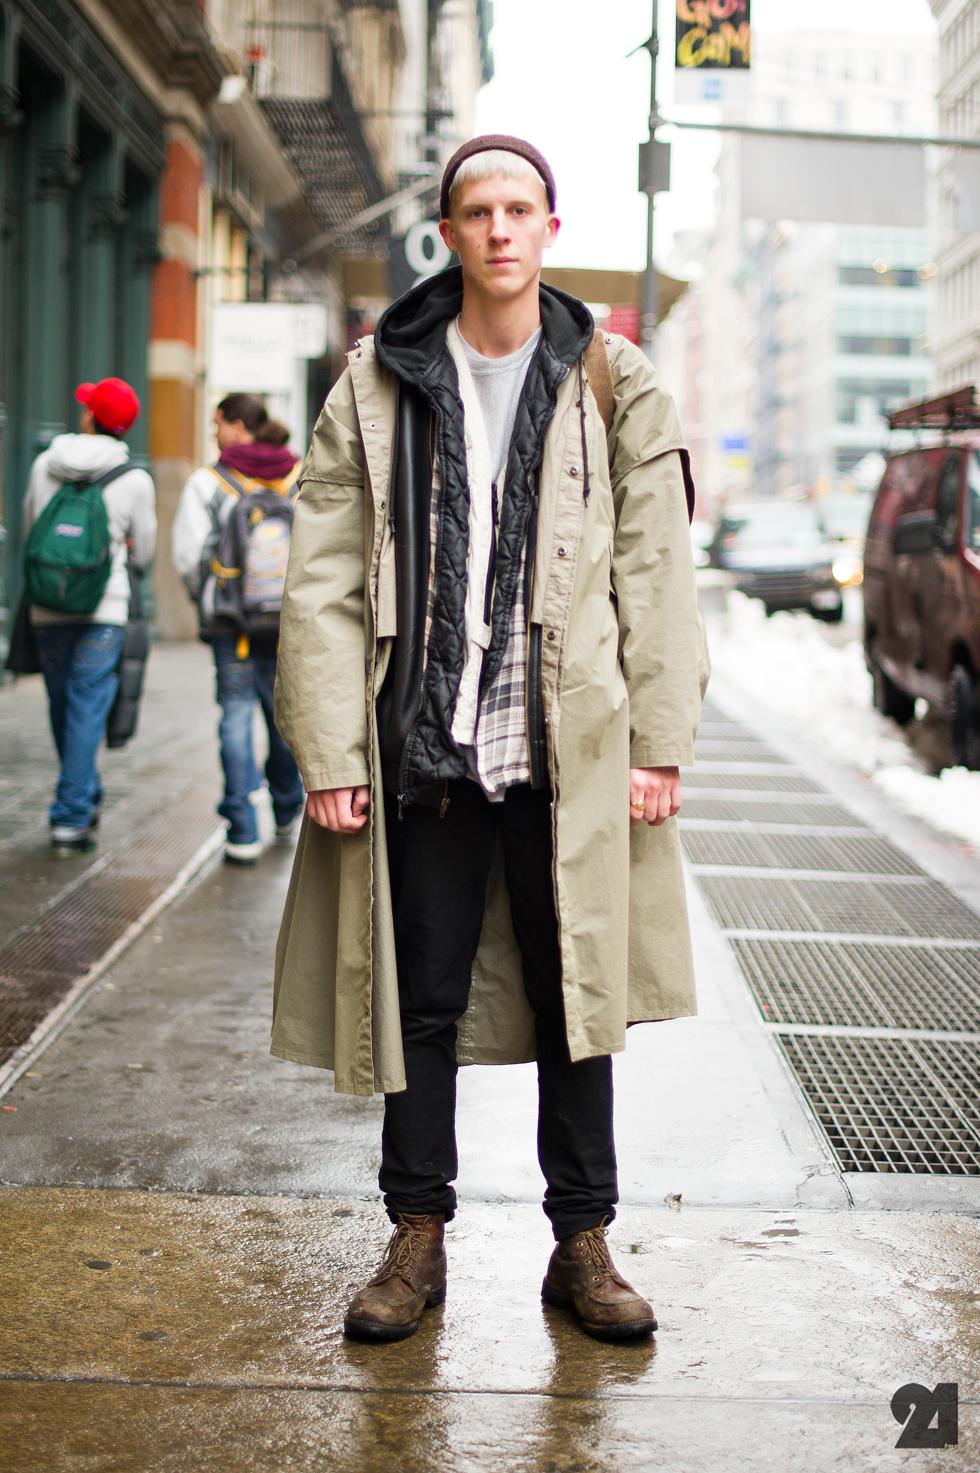 333-Le-21eme-Arrondissement-Adam-Katz-Sinding-Alex-Field-SoHo-New-York-City-Street-Style-Fashion-Blog